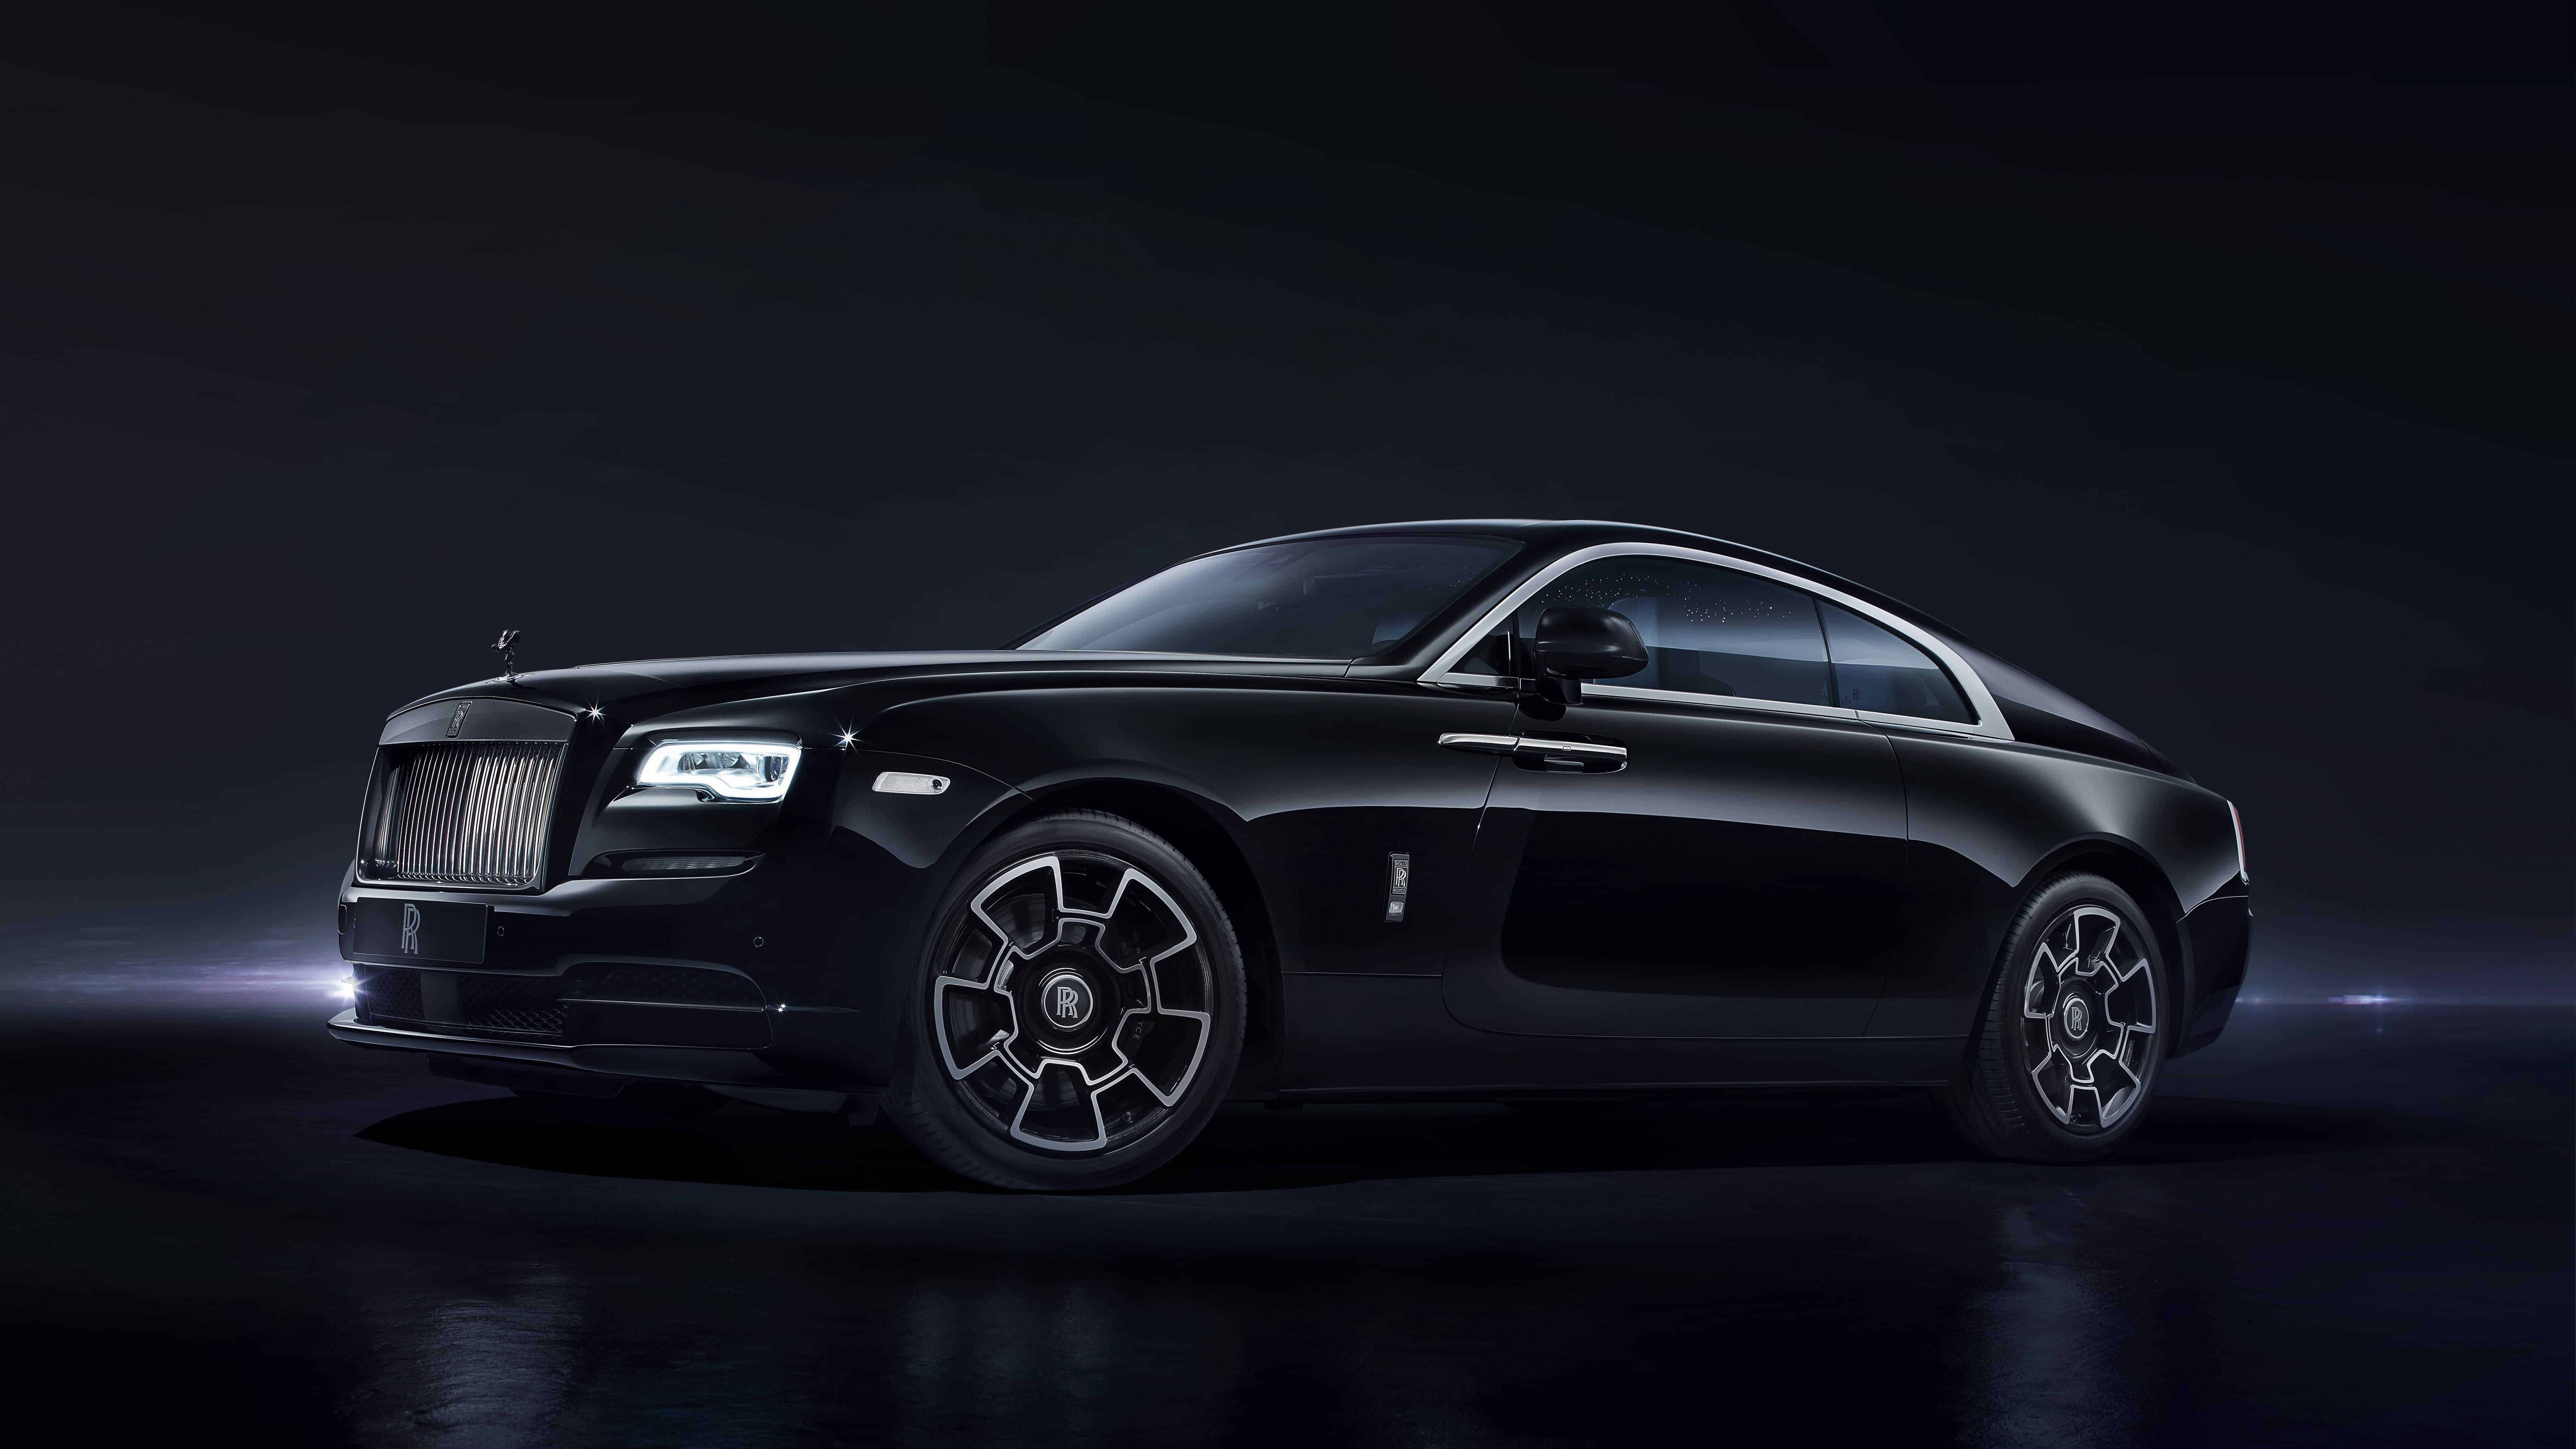 Cars Hd Mobile Wallpapers Rolls Royce Ghost Black Badge Uhd 8k Wallpaper Pixelz